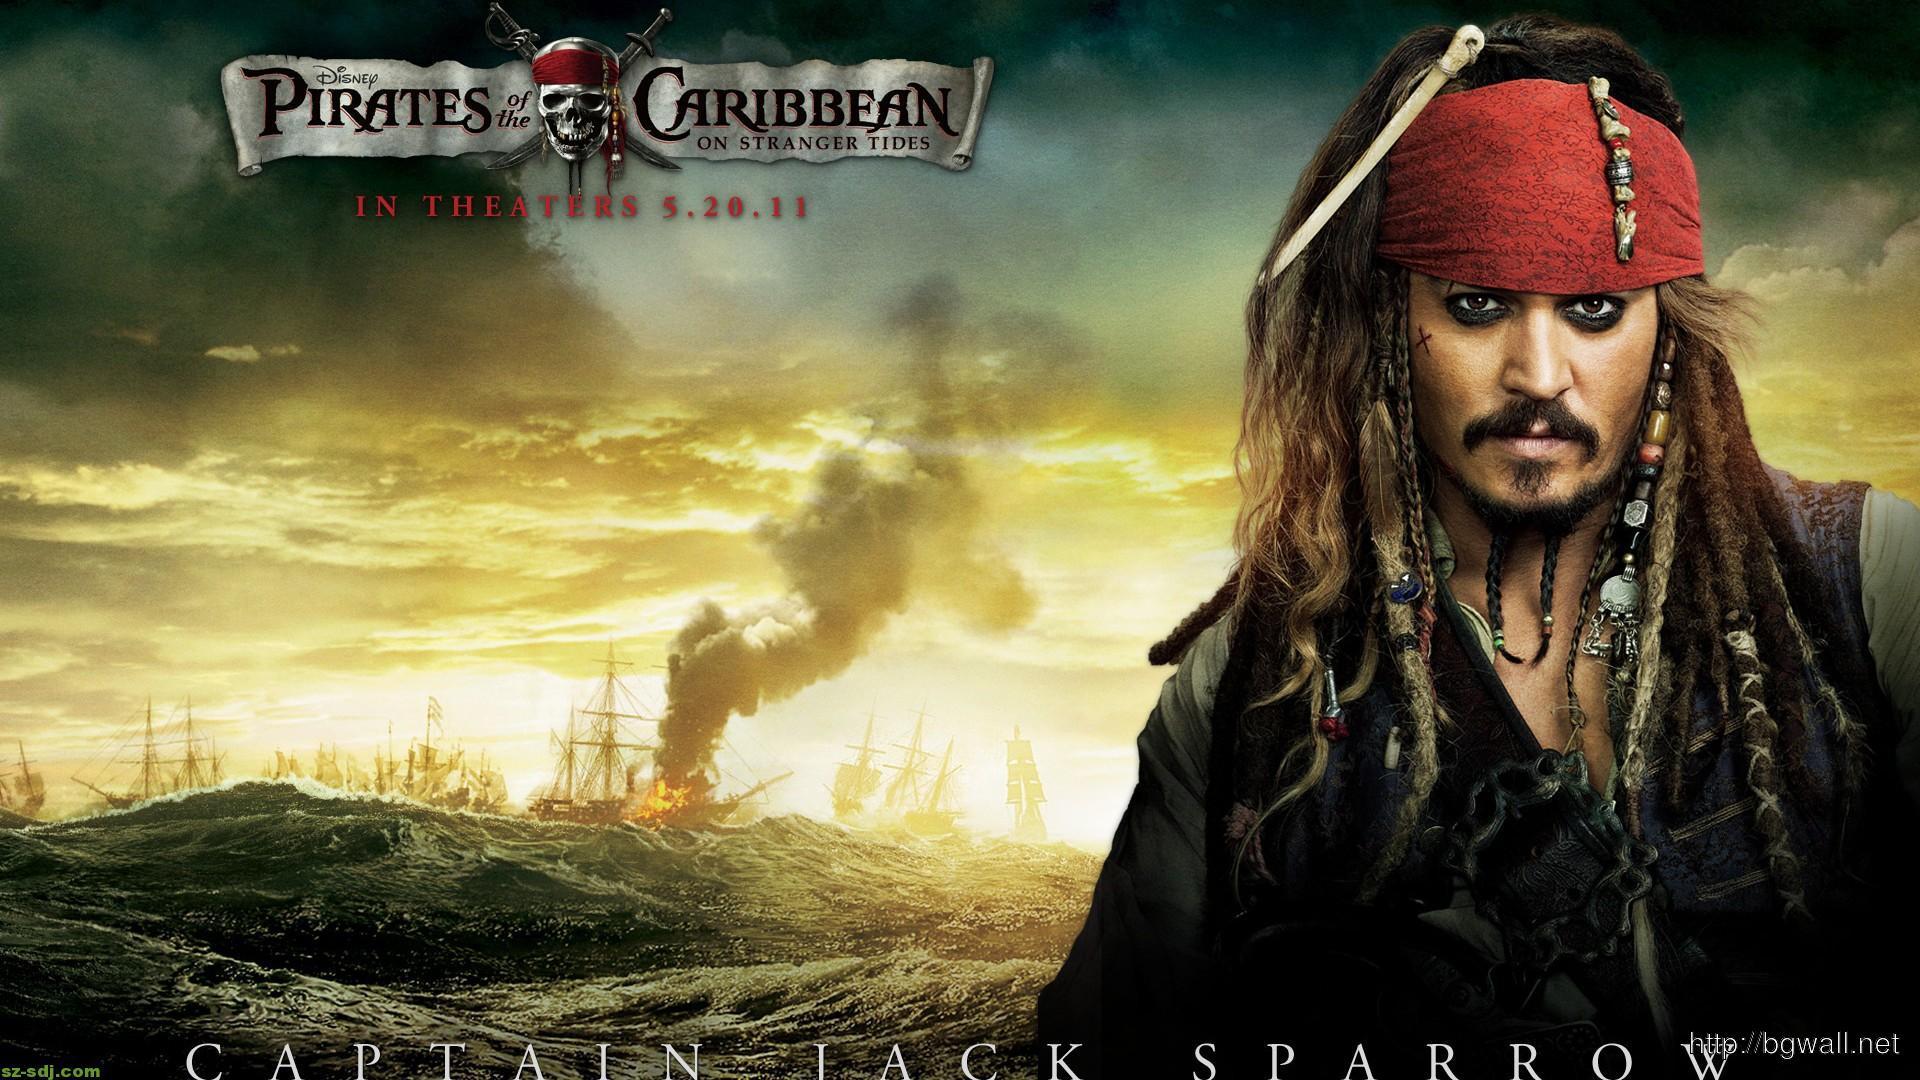 captain-jack-sparrow-pirates-of-caribbean-wallpaper